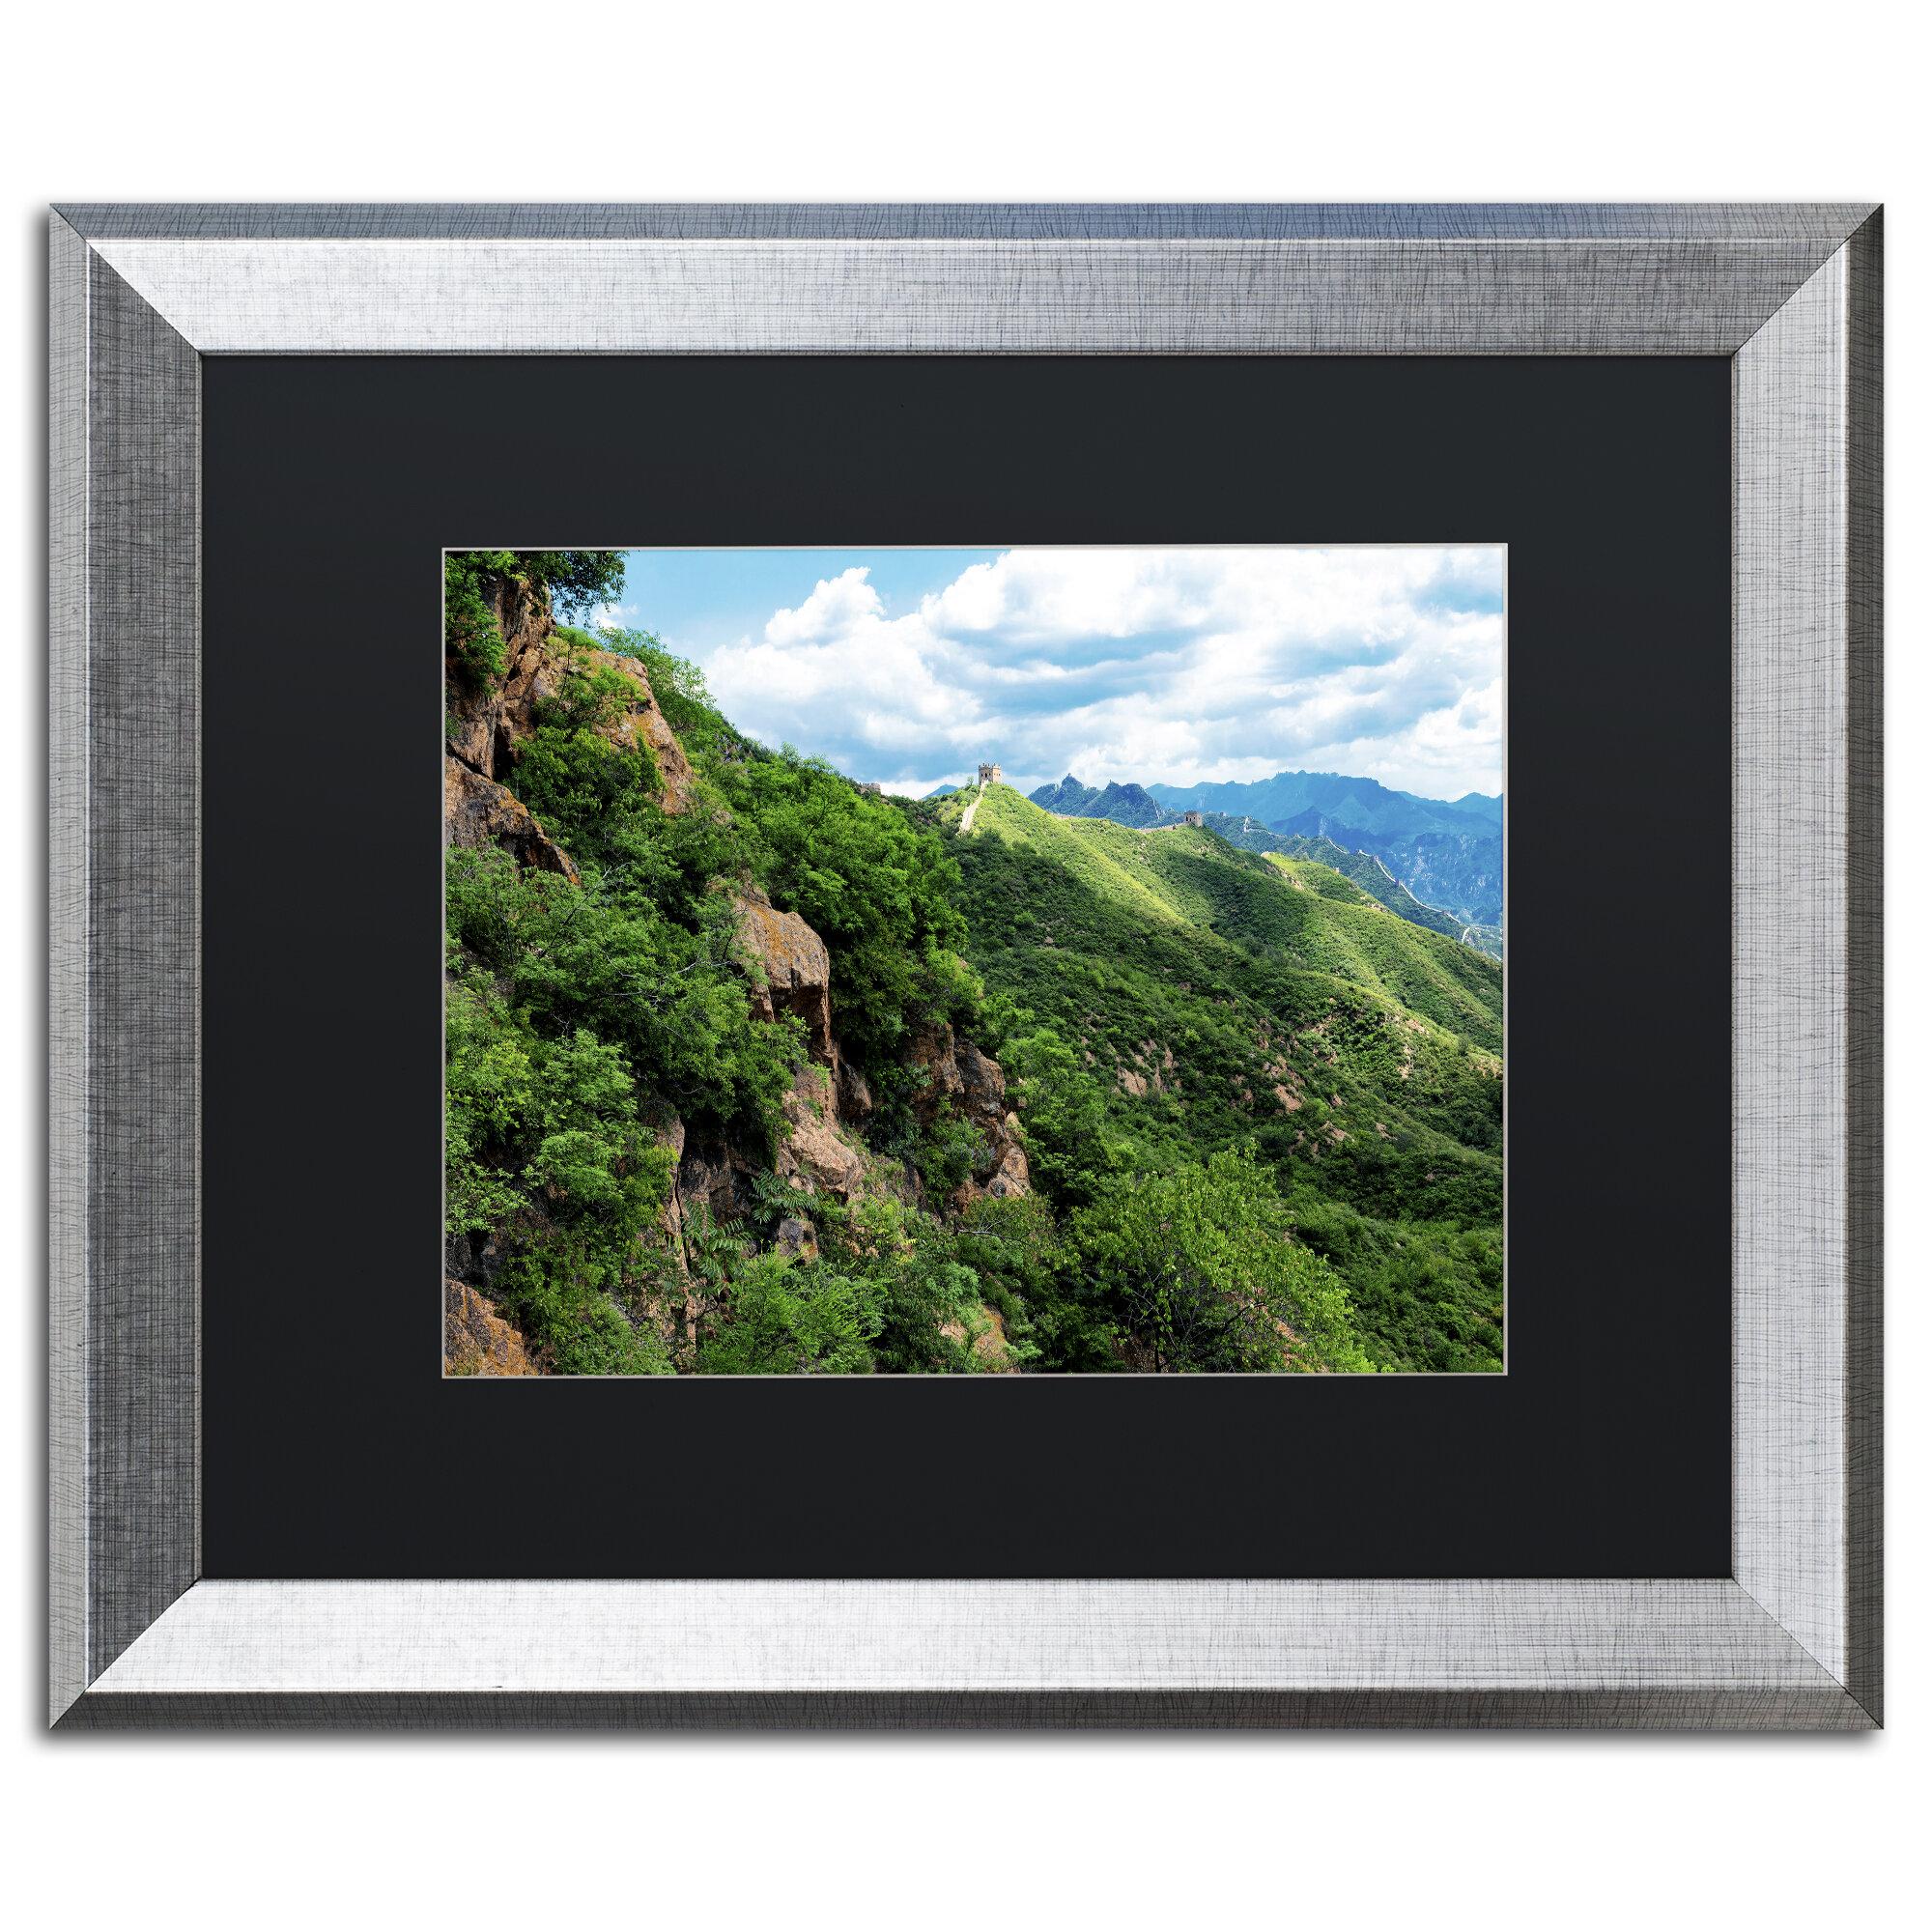 Trademark Art Great Wall Xv By Philippe Hugonnard Framed Photographic Print Wayfair